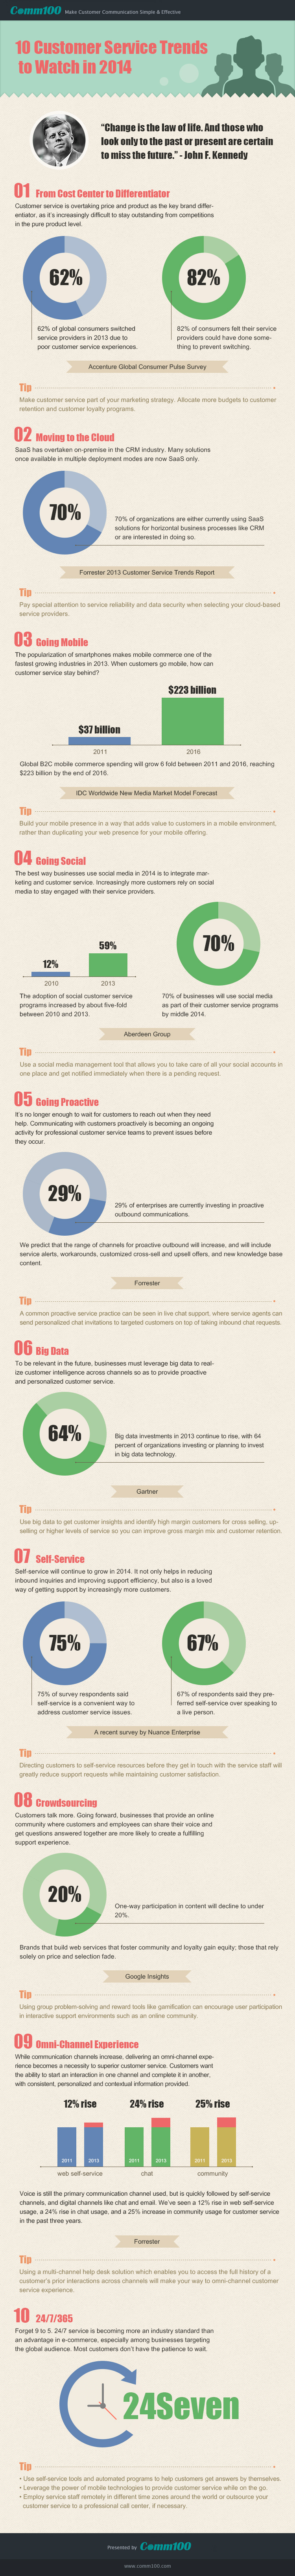 10 Customer Service Trends 2014